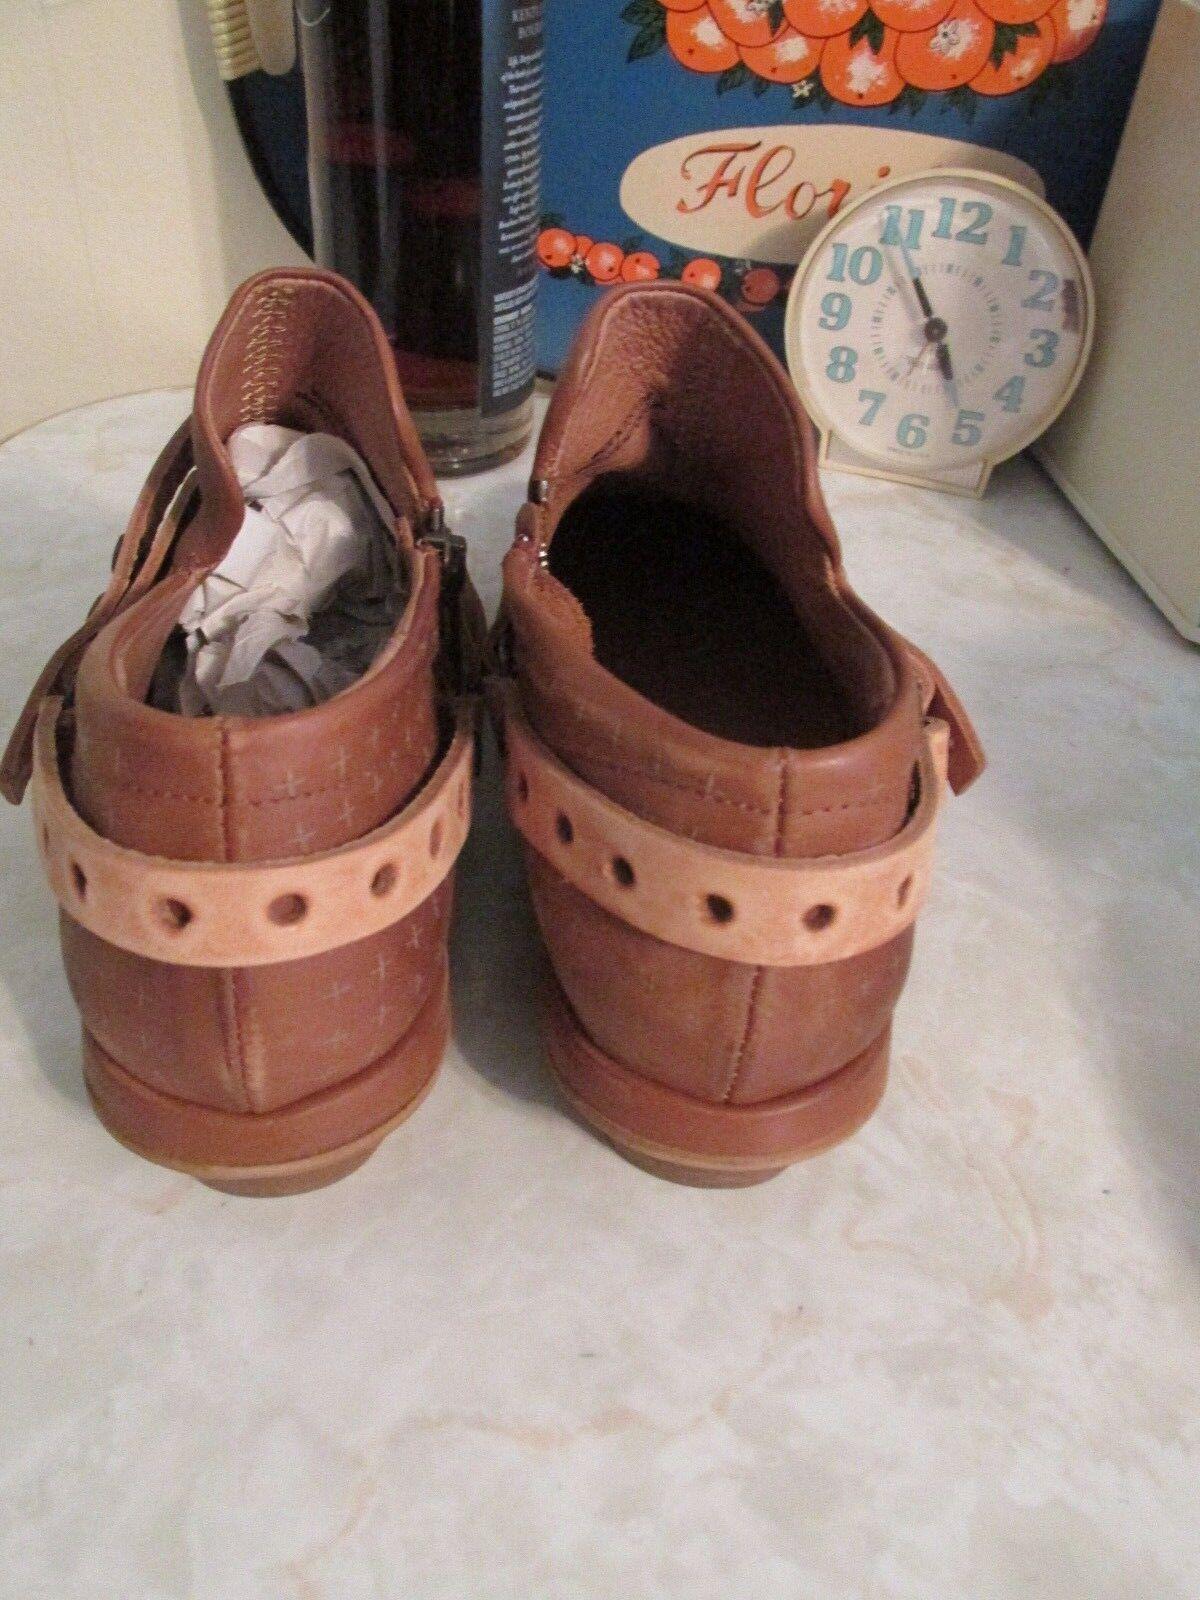 Free People Tan Leather Vicente View Ankle Stiefel Shooties Shooties Shooties EU 38 US 7.5 8 62ac99